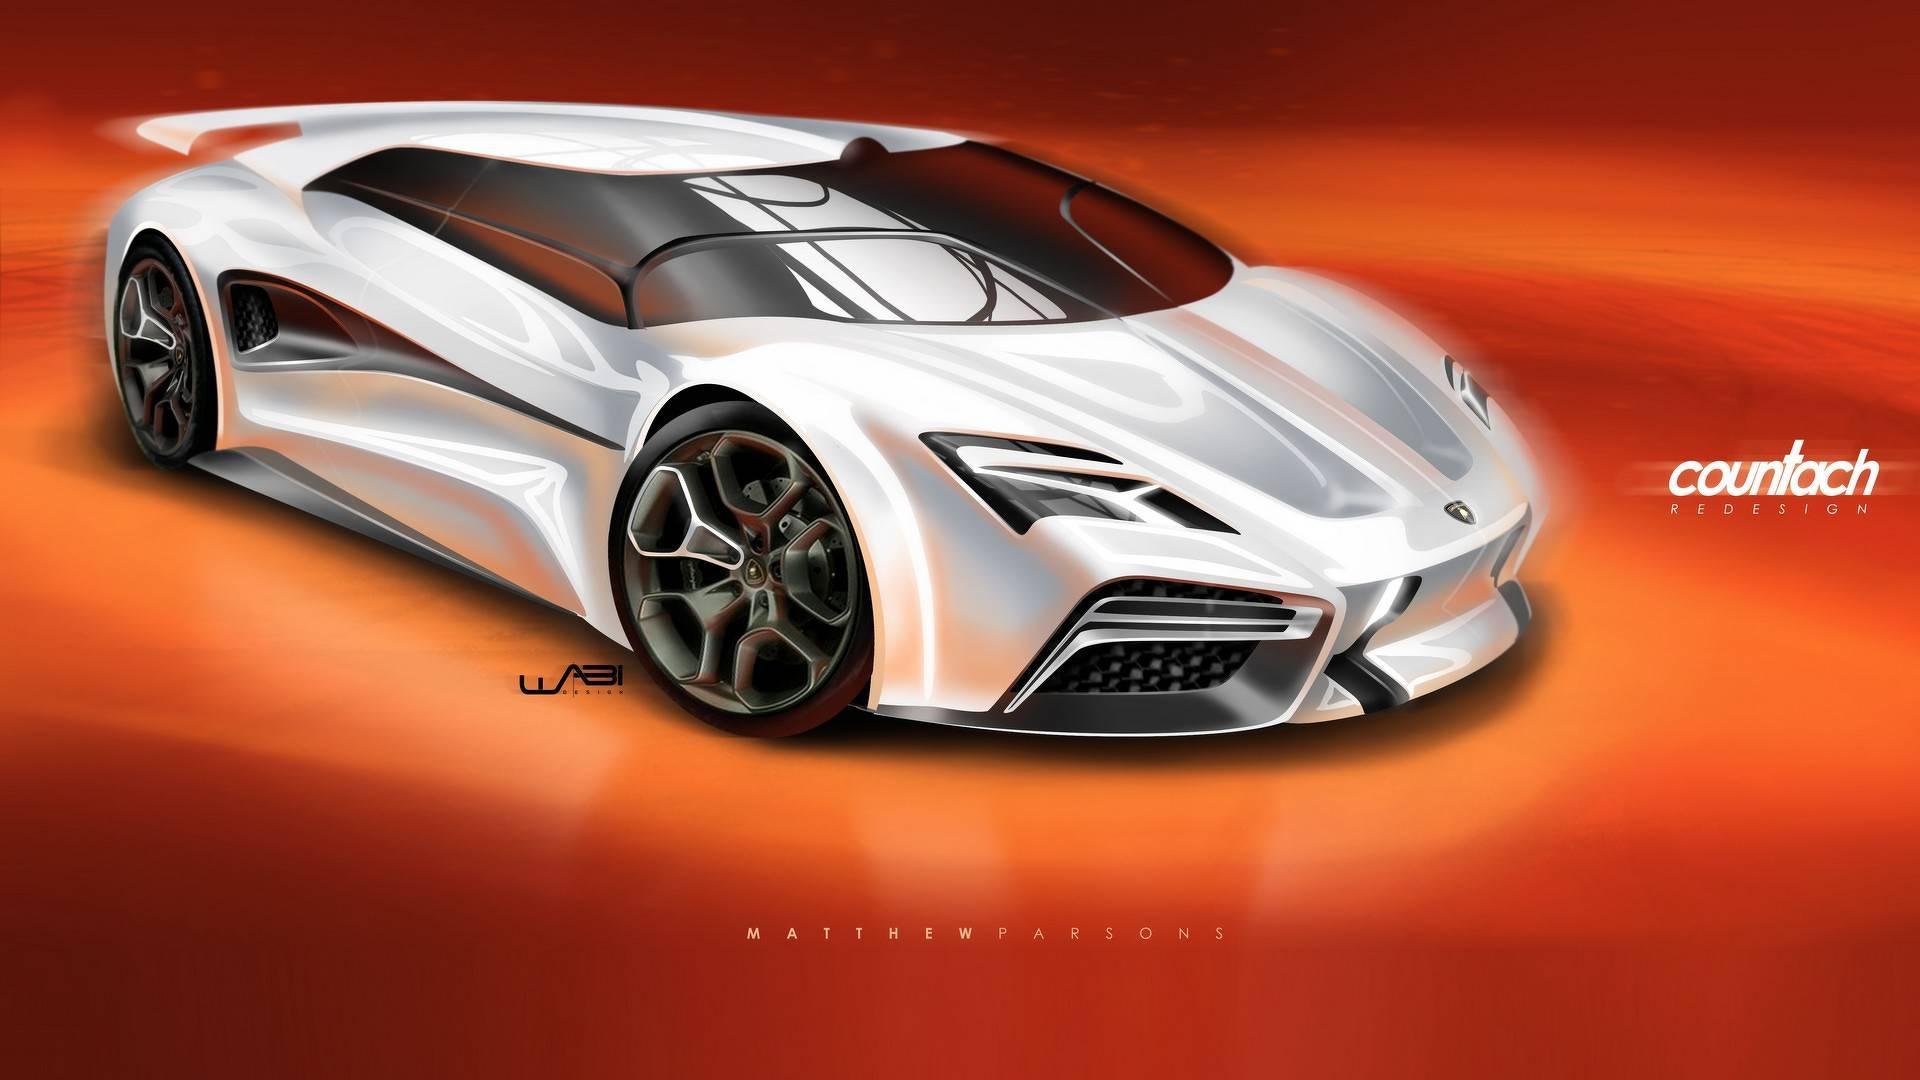 Lamborghini Countach Render Gives The Supercar A Virtual Reboot